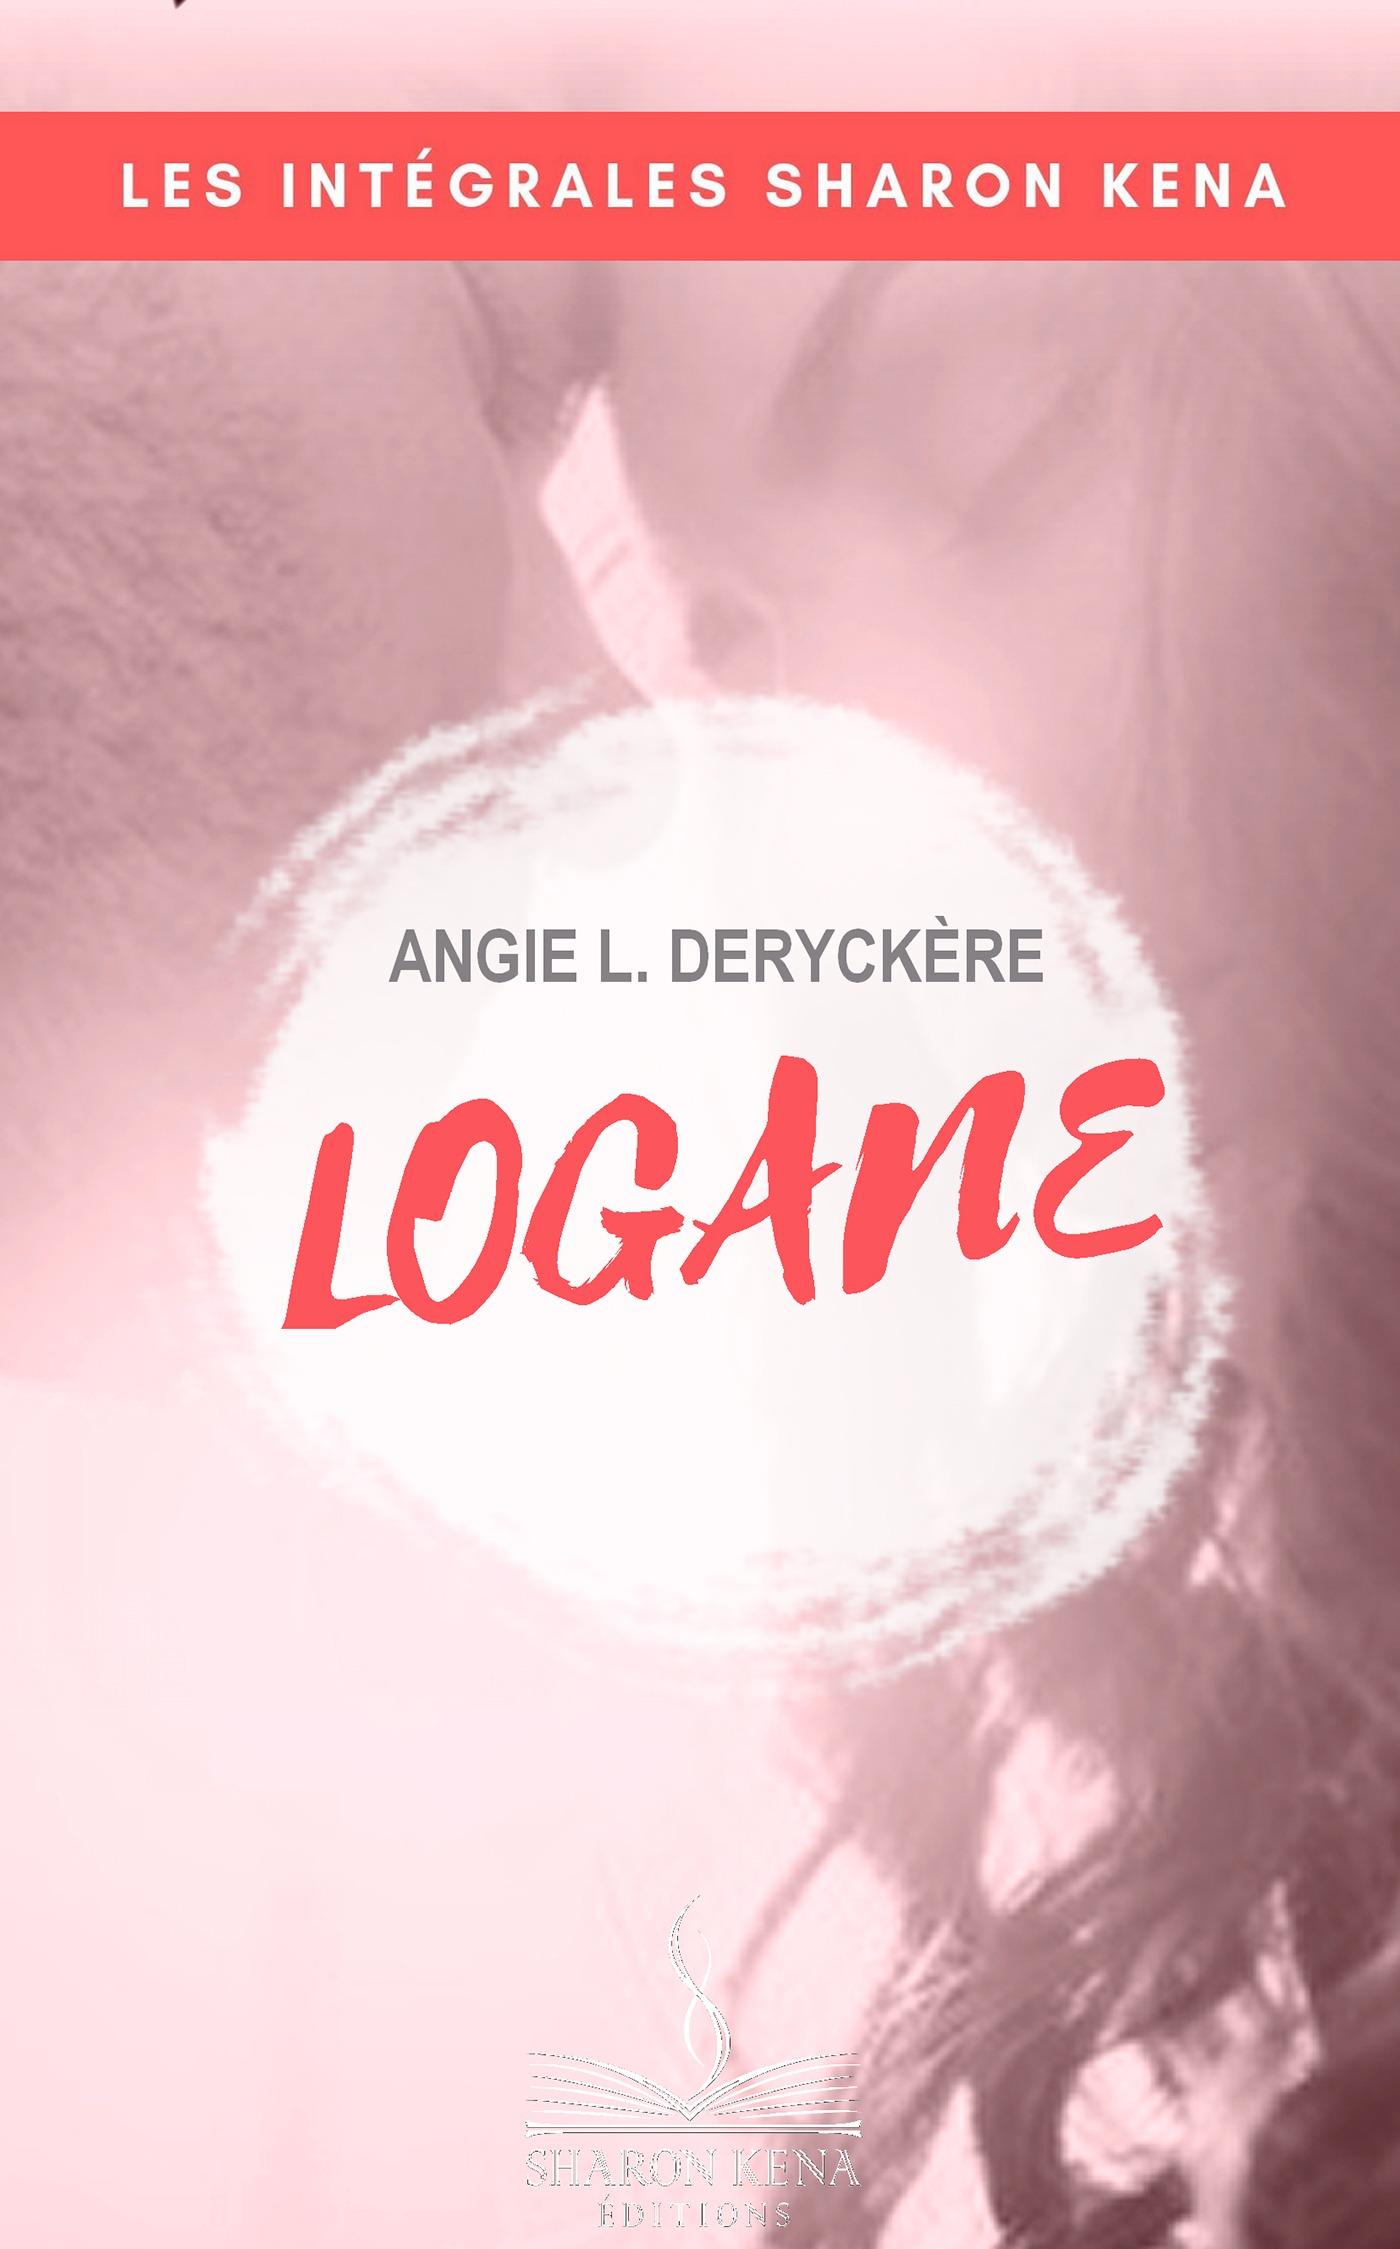 Logane - L'intégrale